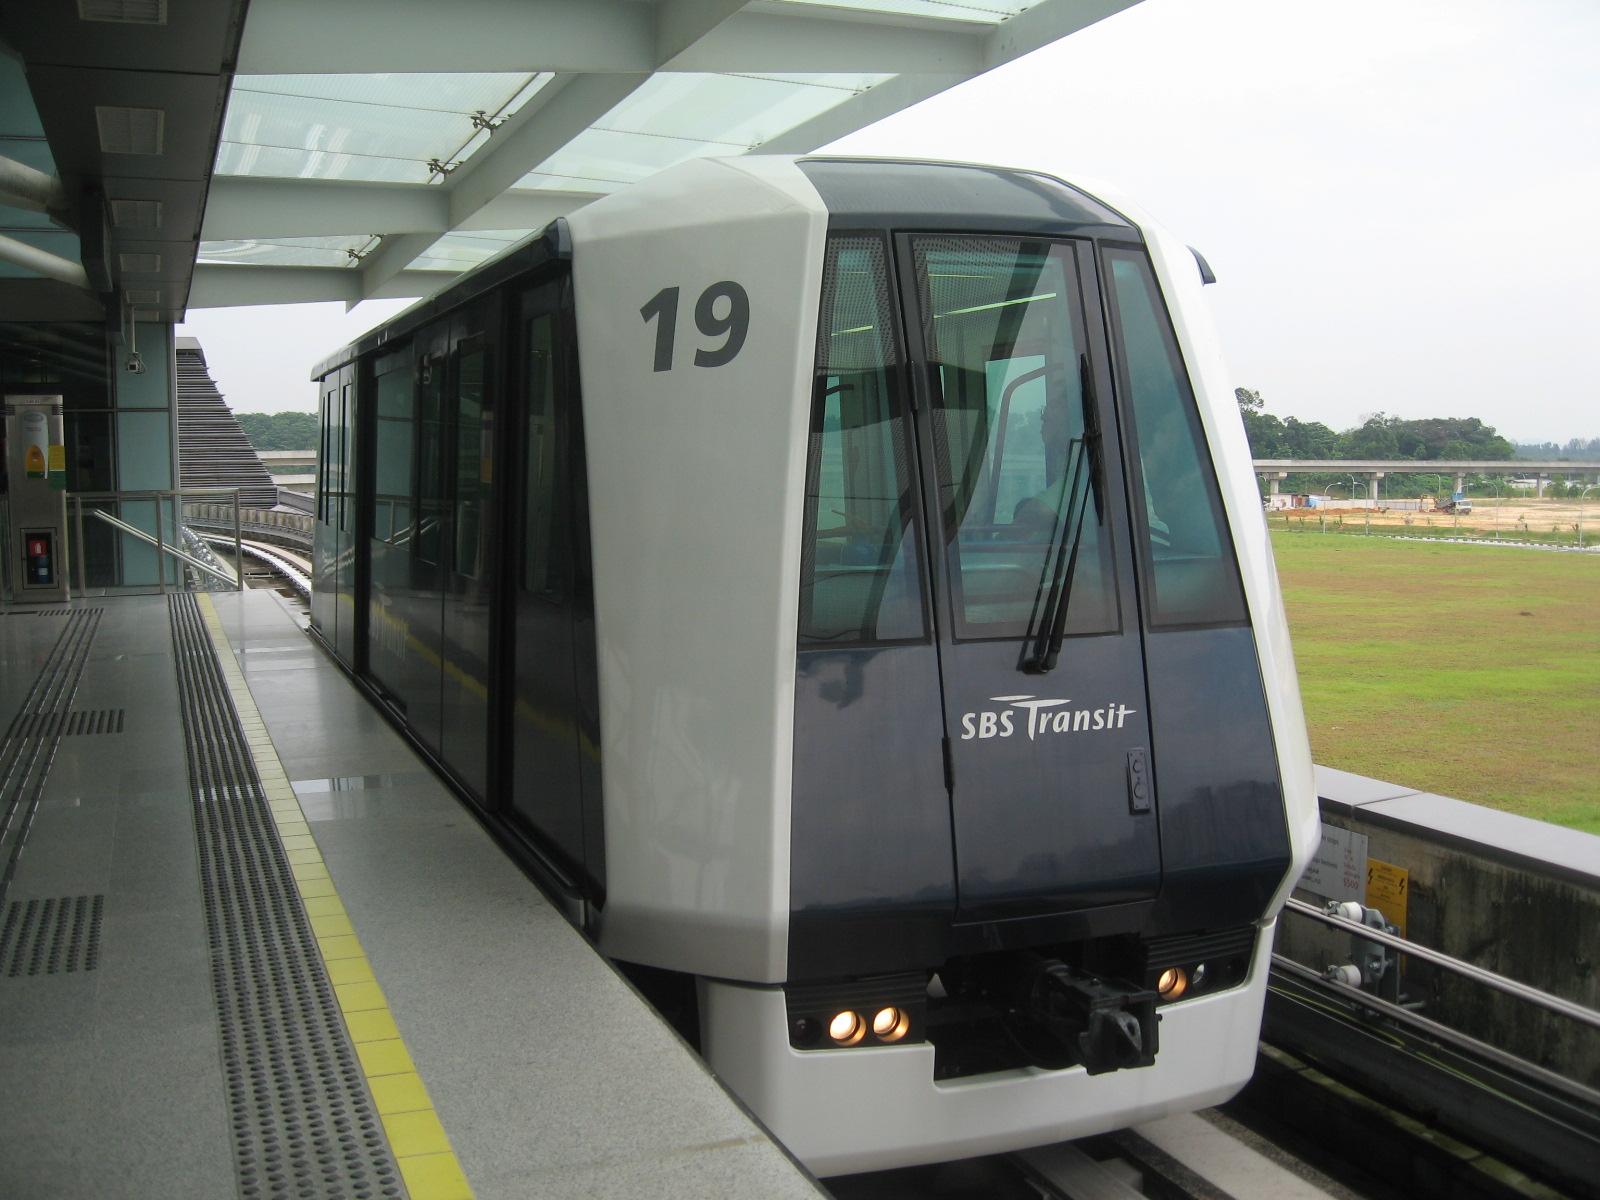 تراموا هیبریدی LRT + عکس و توضیحات